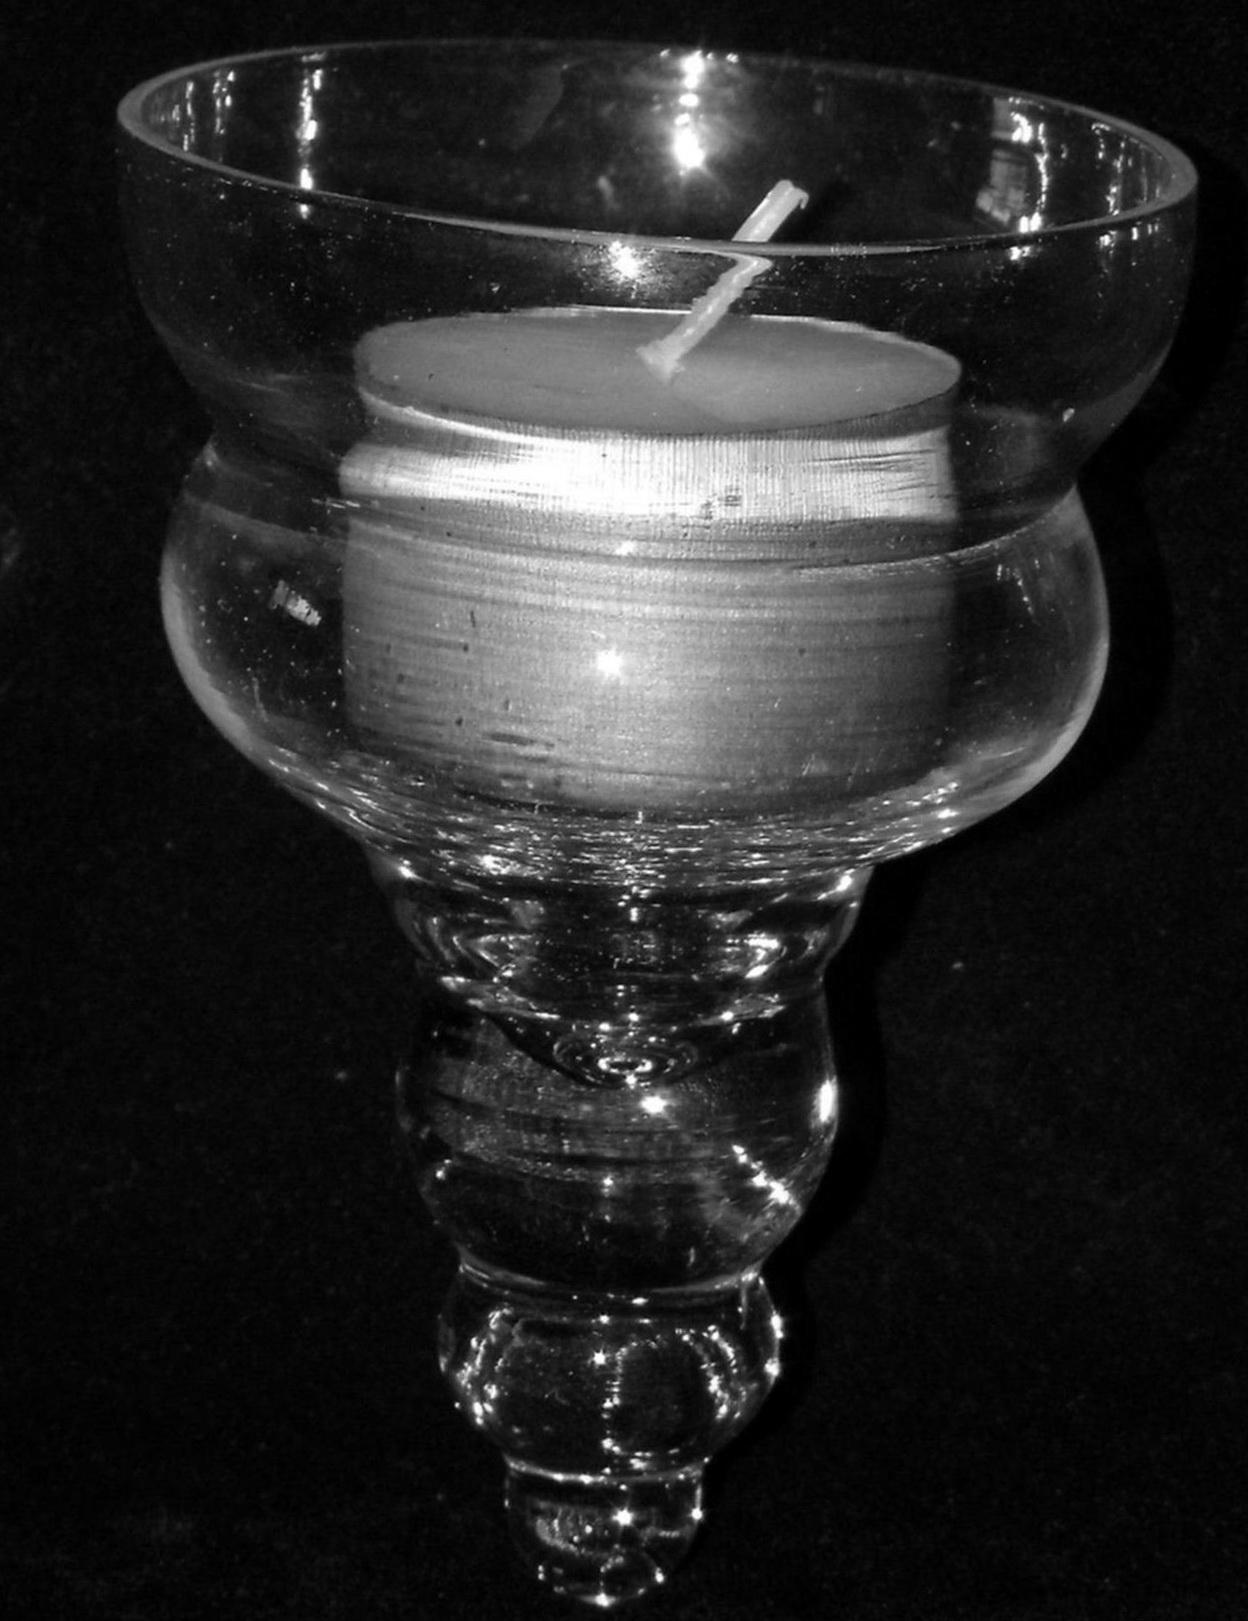 Chandelier Replacement Glass Teardrop Cup